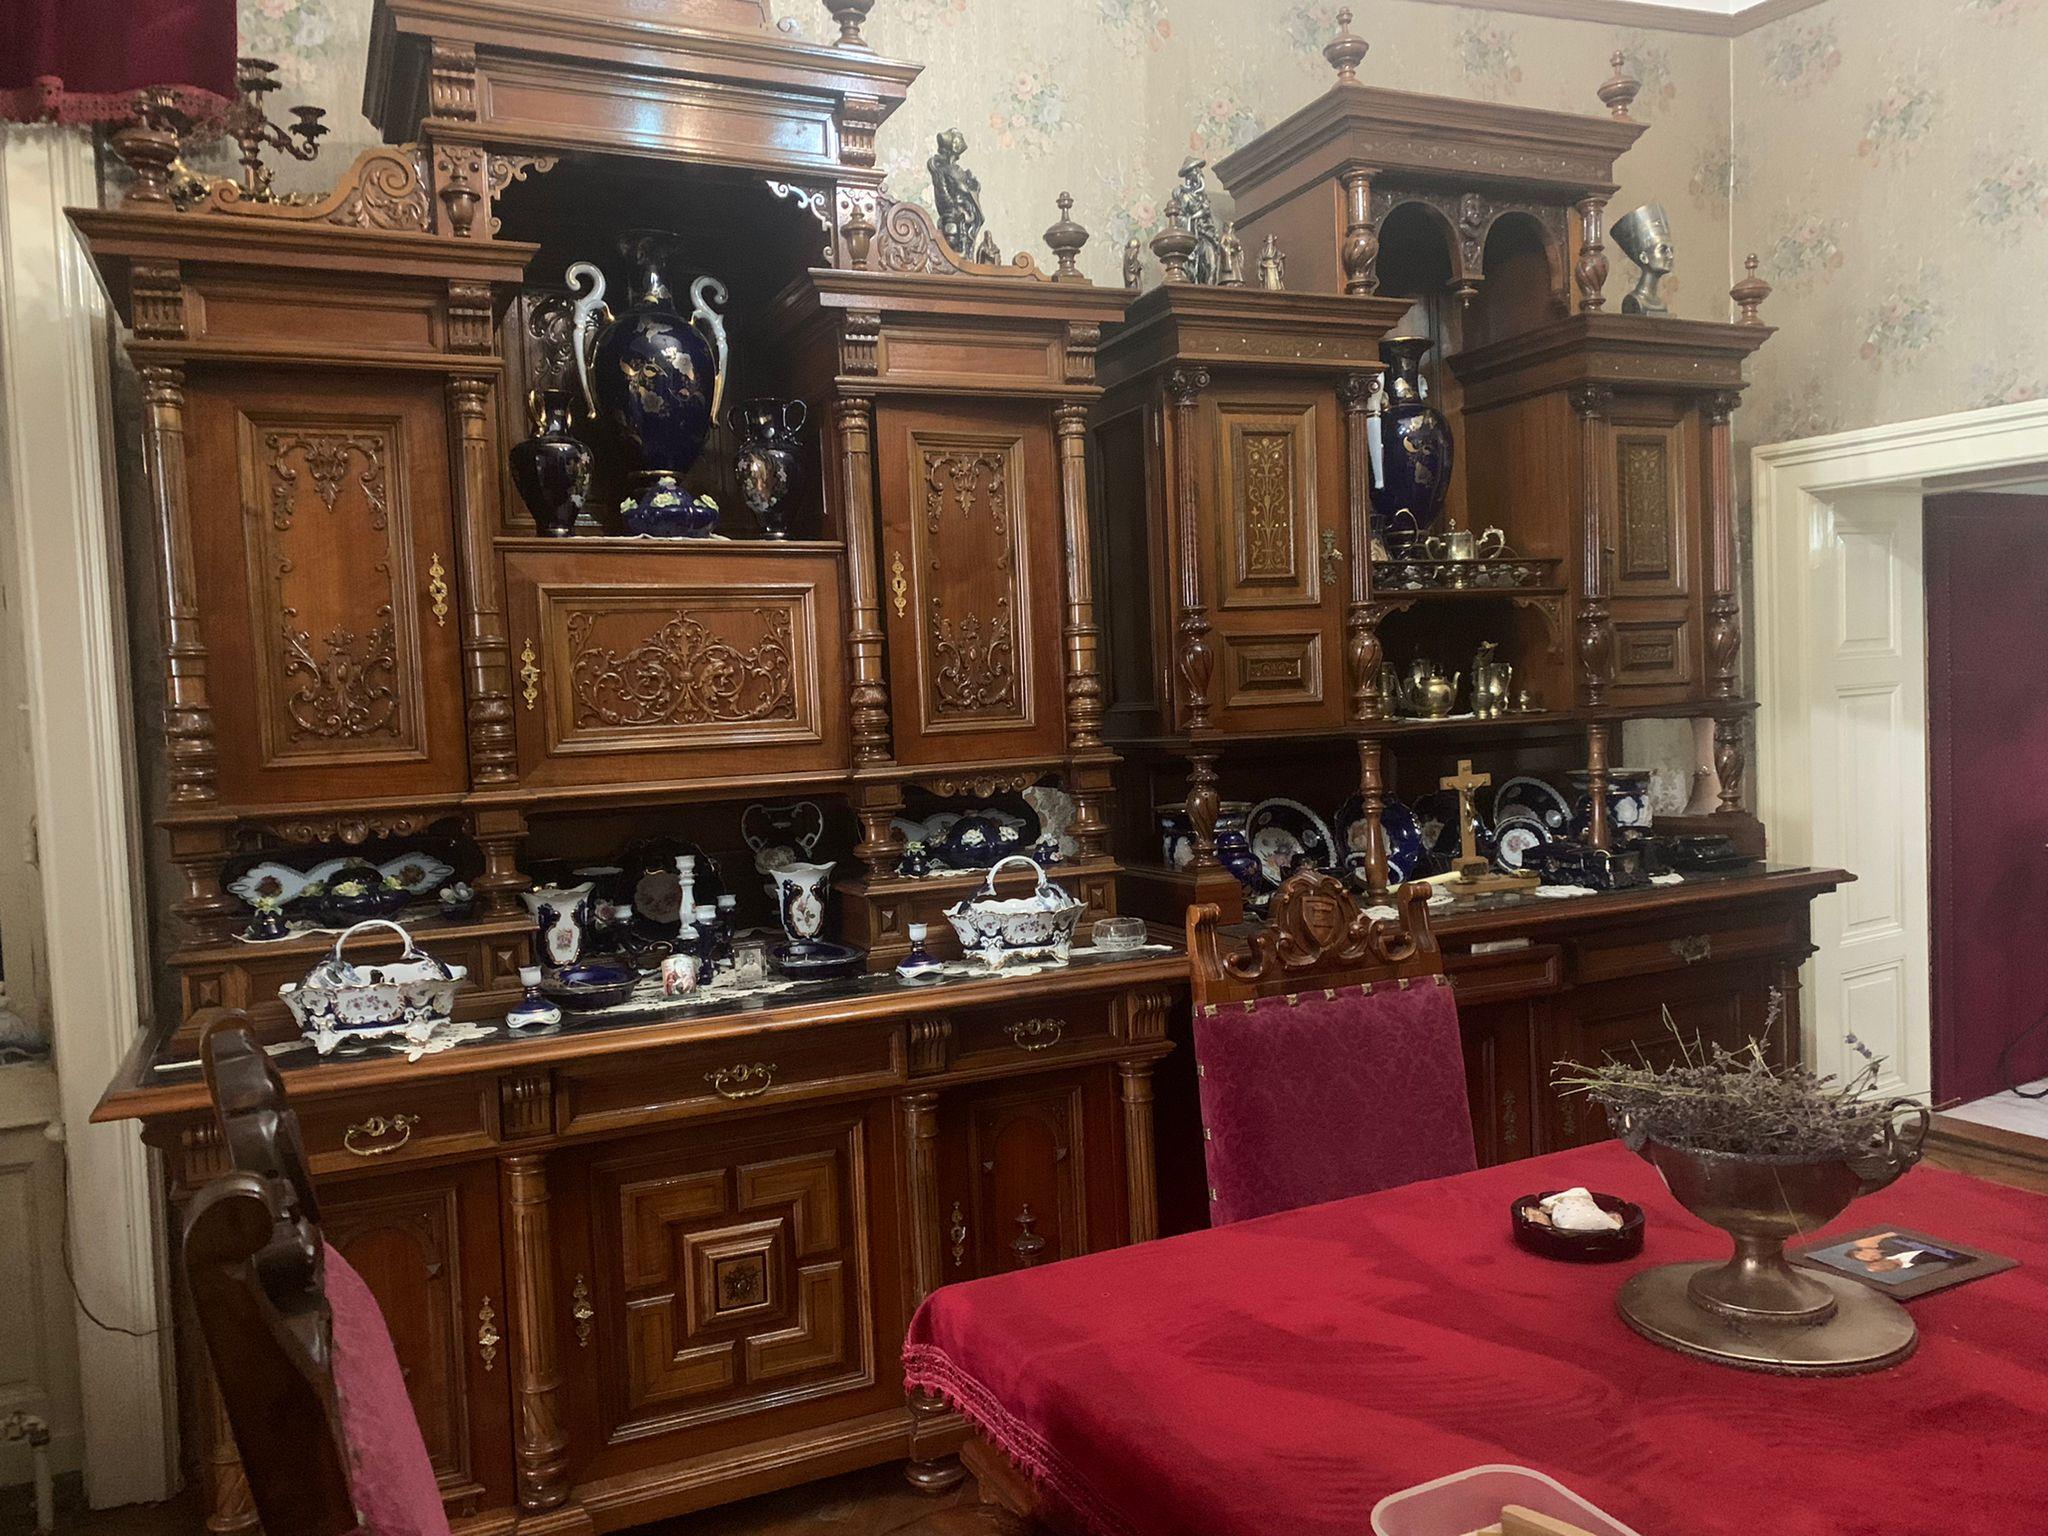 Vand apartament 3 camere zona Ultracentrala-Vasile Goldis